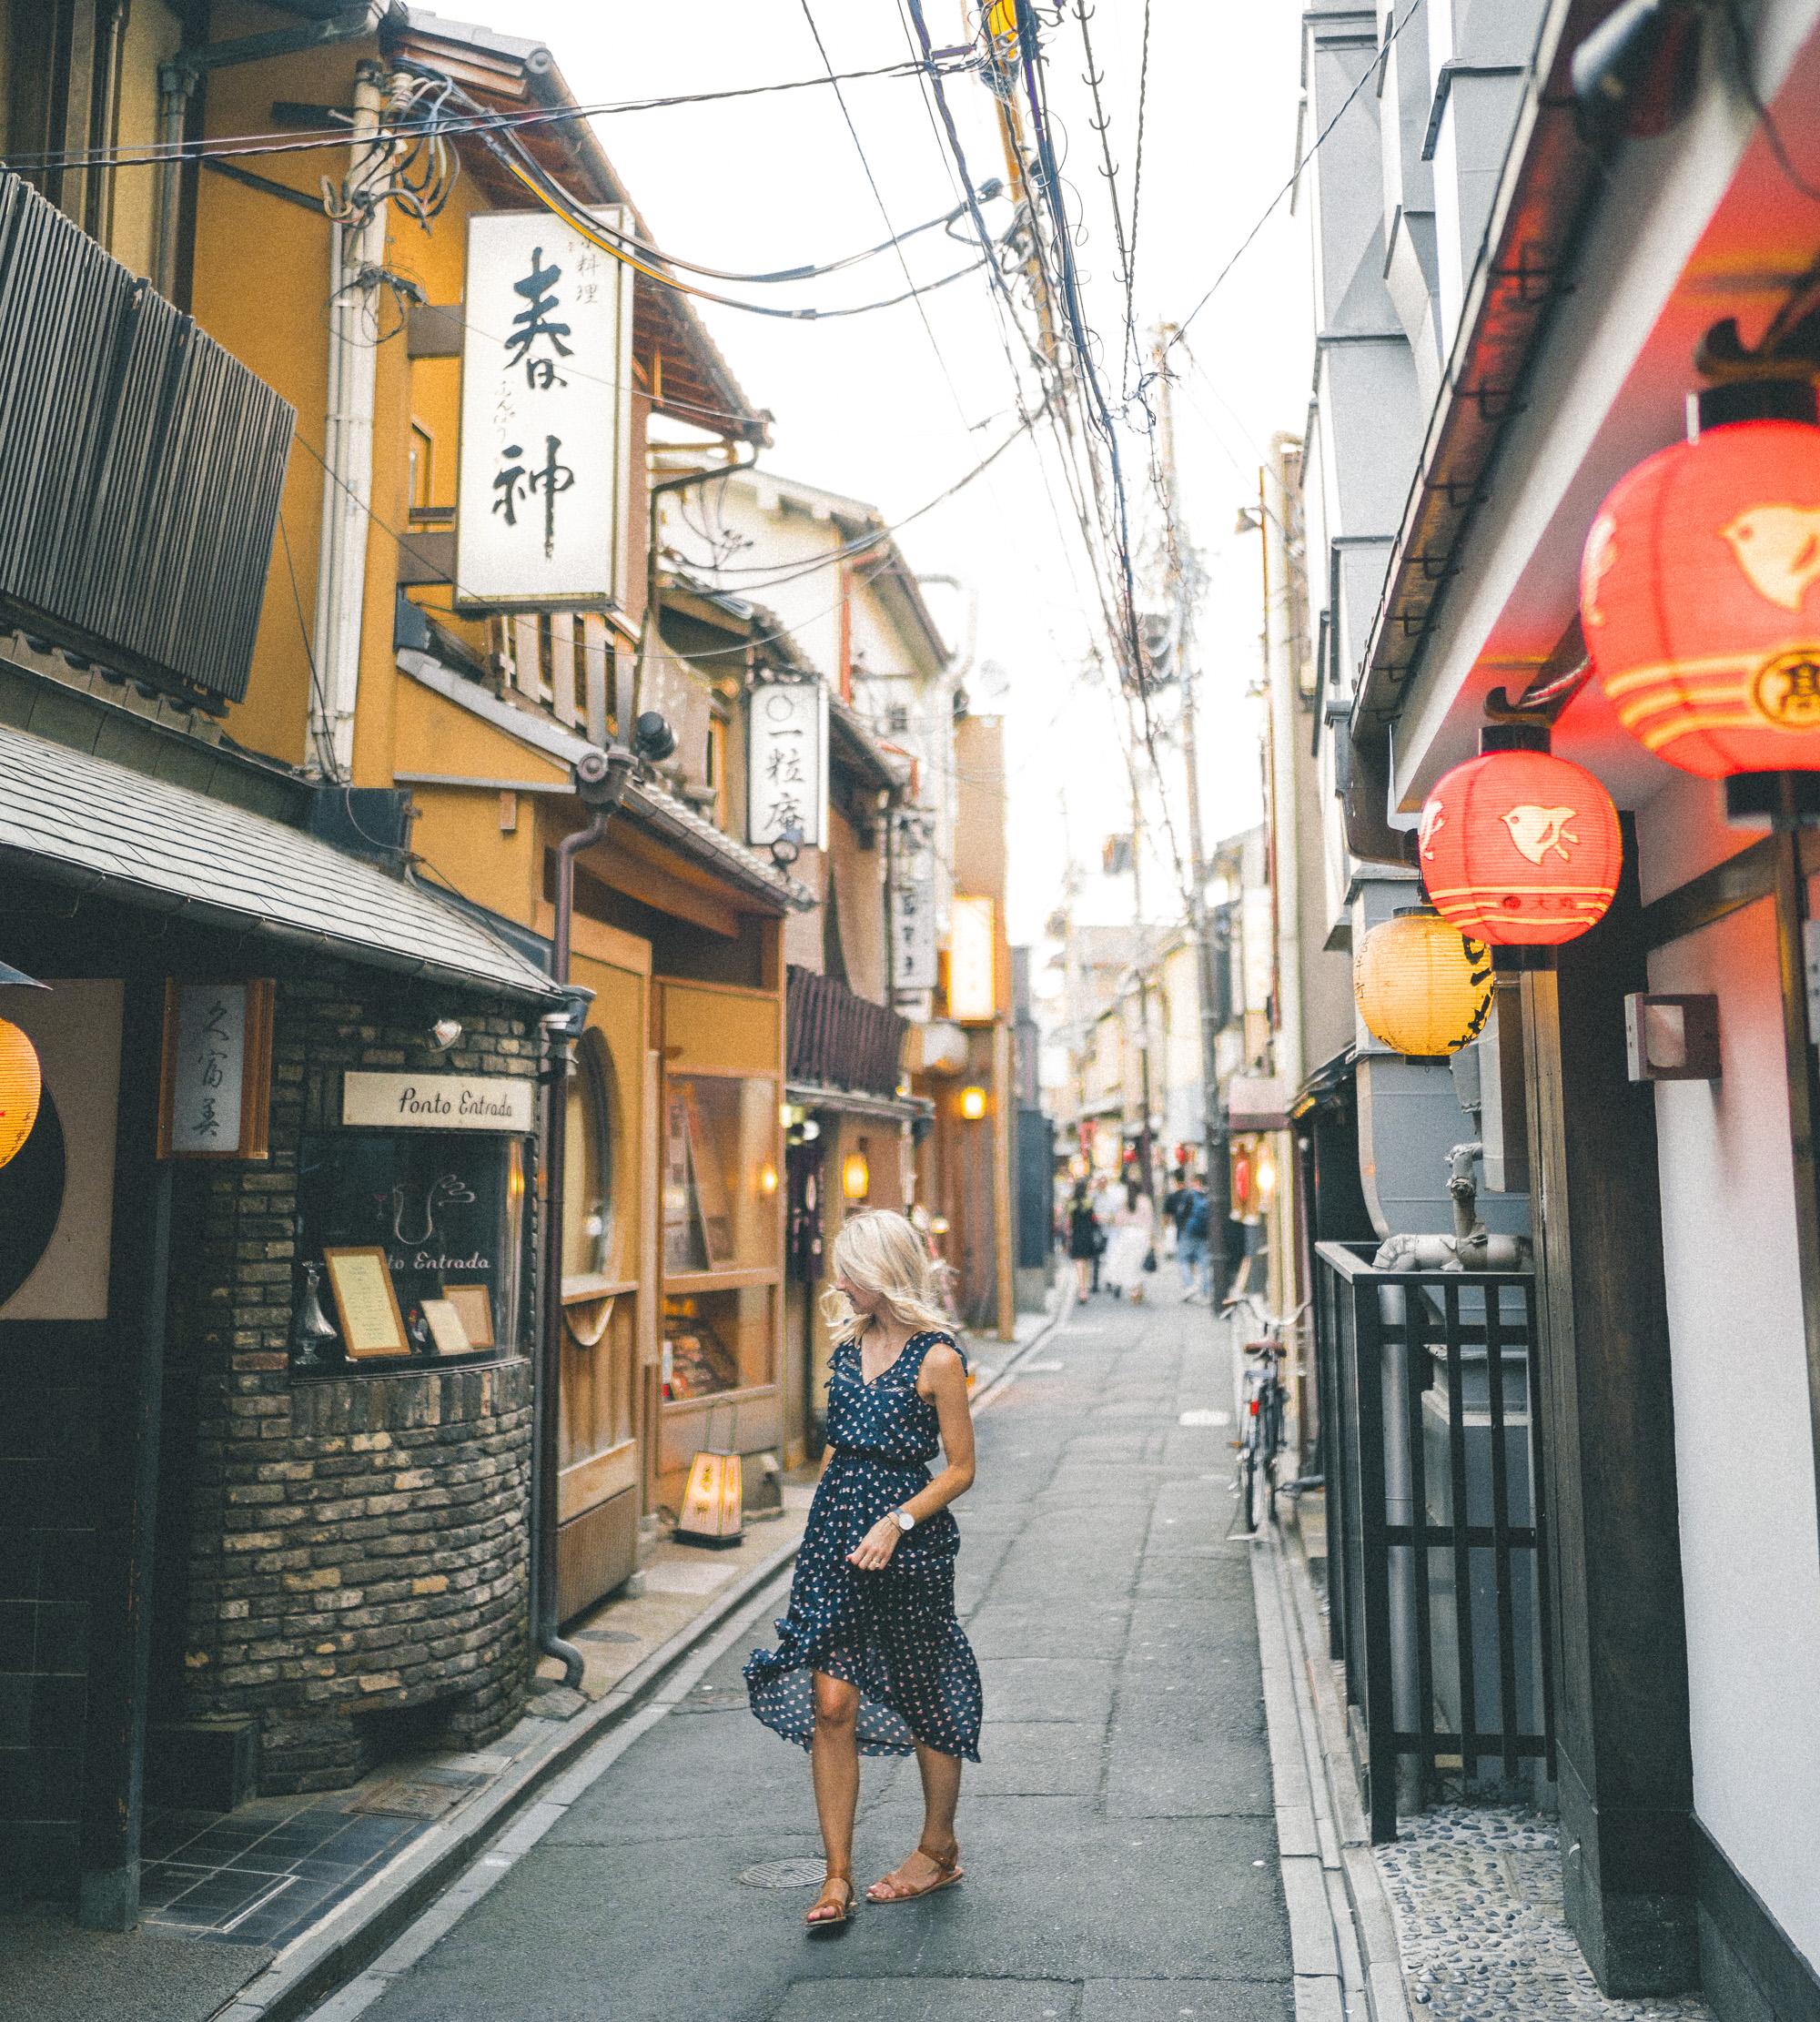 Backstreets of Shijo Dori in Kyoto, Japan | 24 Hour Guide to Kyoto, Japan | 1 Day Guide Kyoto | Kyoto City Guide | Kyoto Travel Itinerary